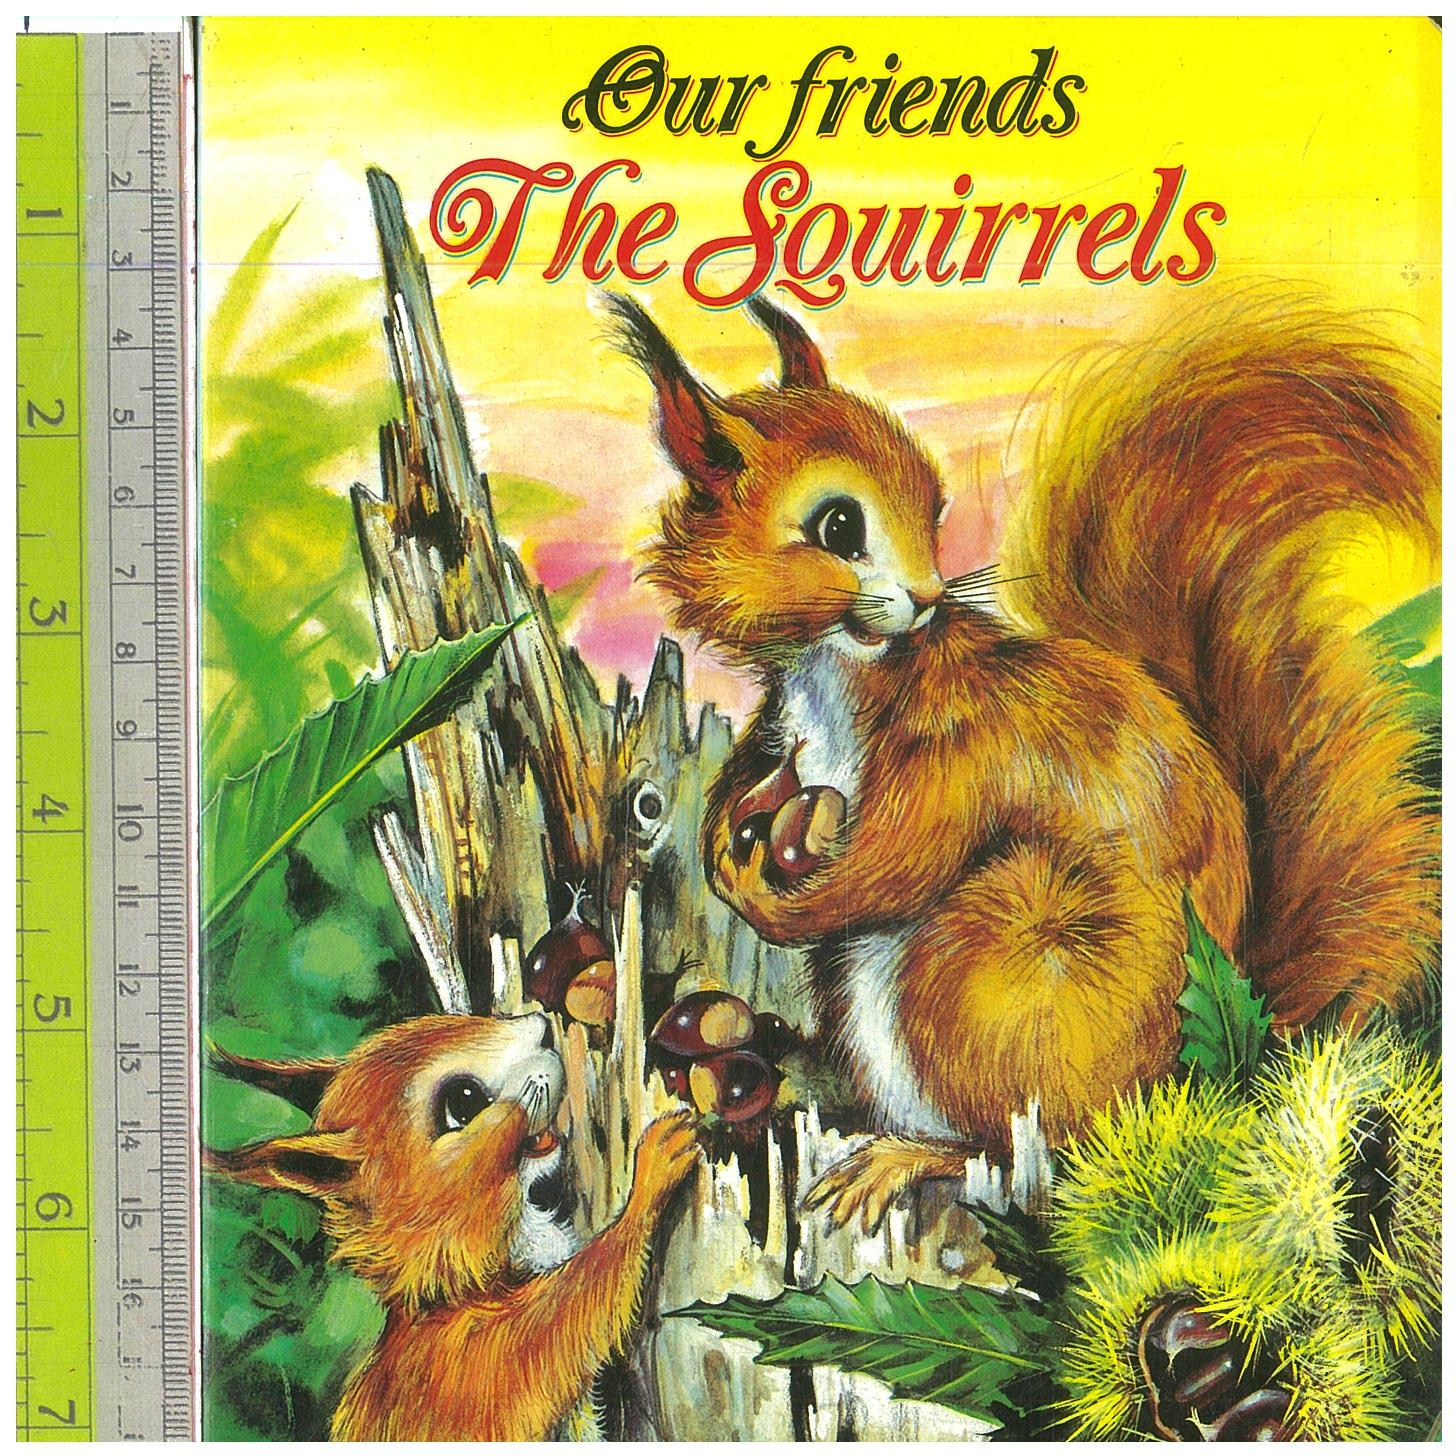 Souirrels